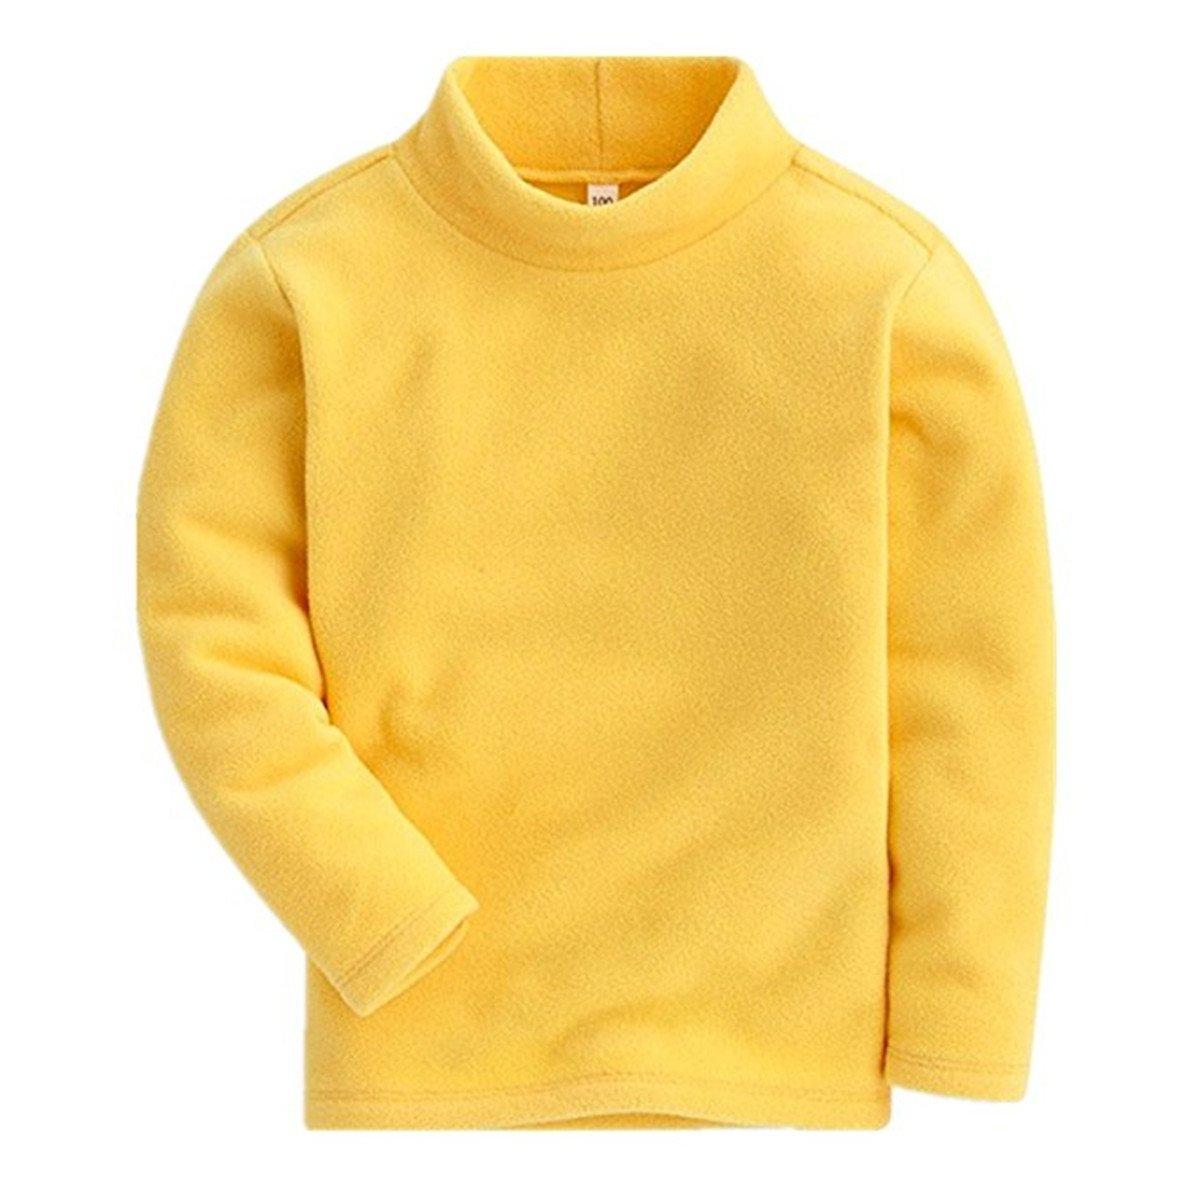 Kids Toddler Little Girls Long Sleeve Soild Color Slim Warmth Tops T-shirt Blouse 3T